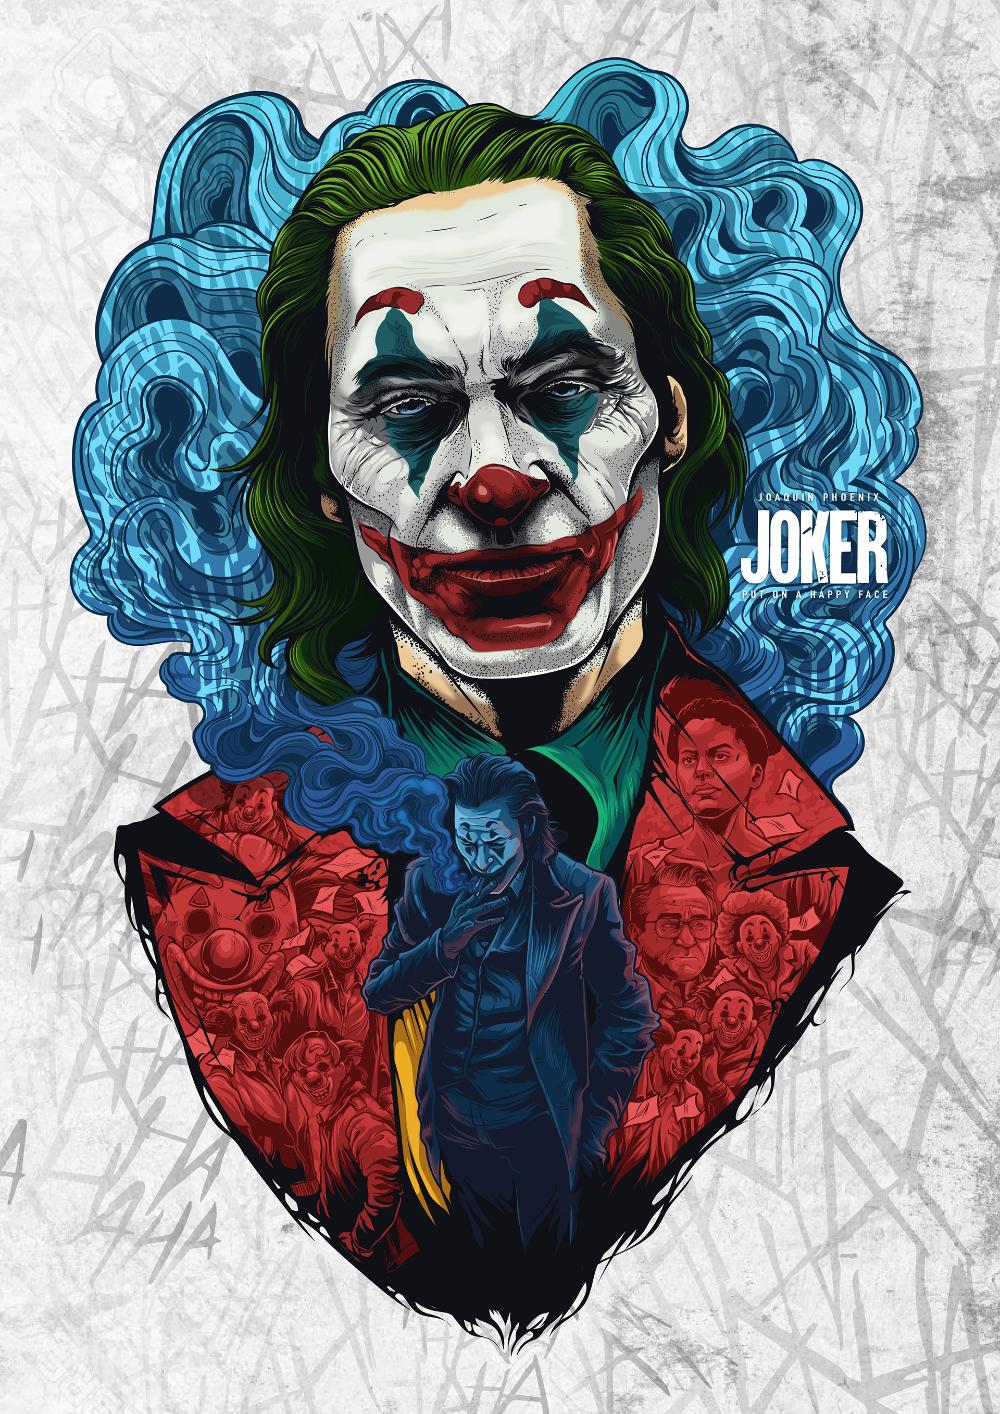 Joker Damaged Tattoo Png: Joker Art, Joker Drawings